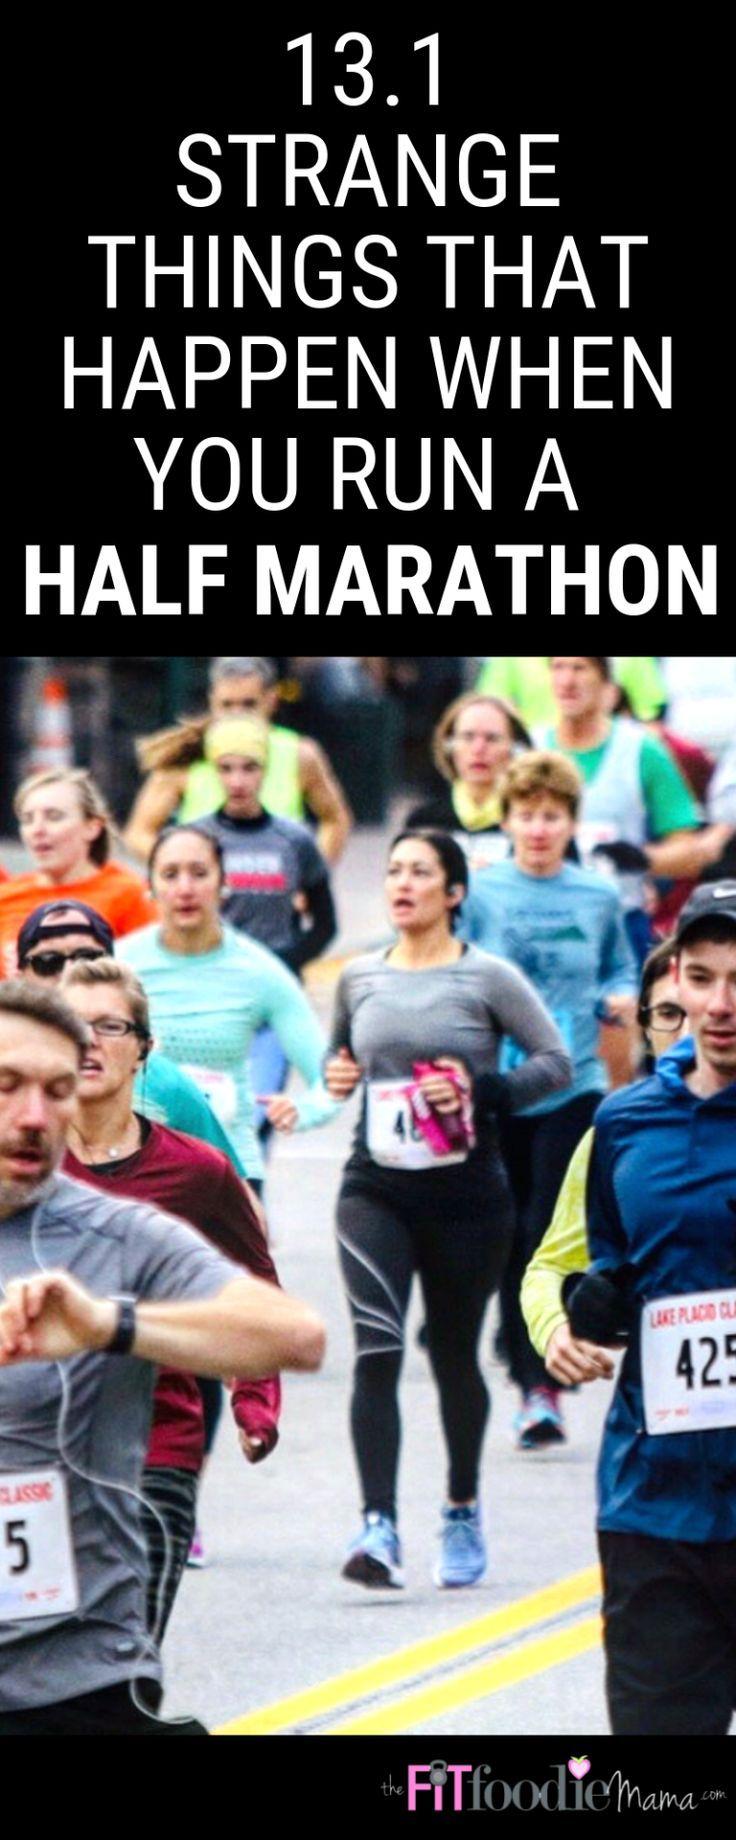 131 strange things that happen when you run a half